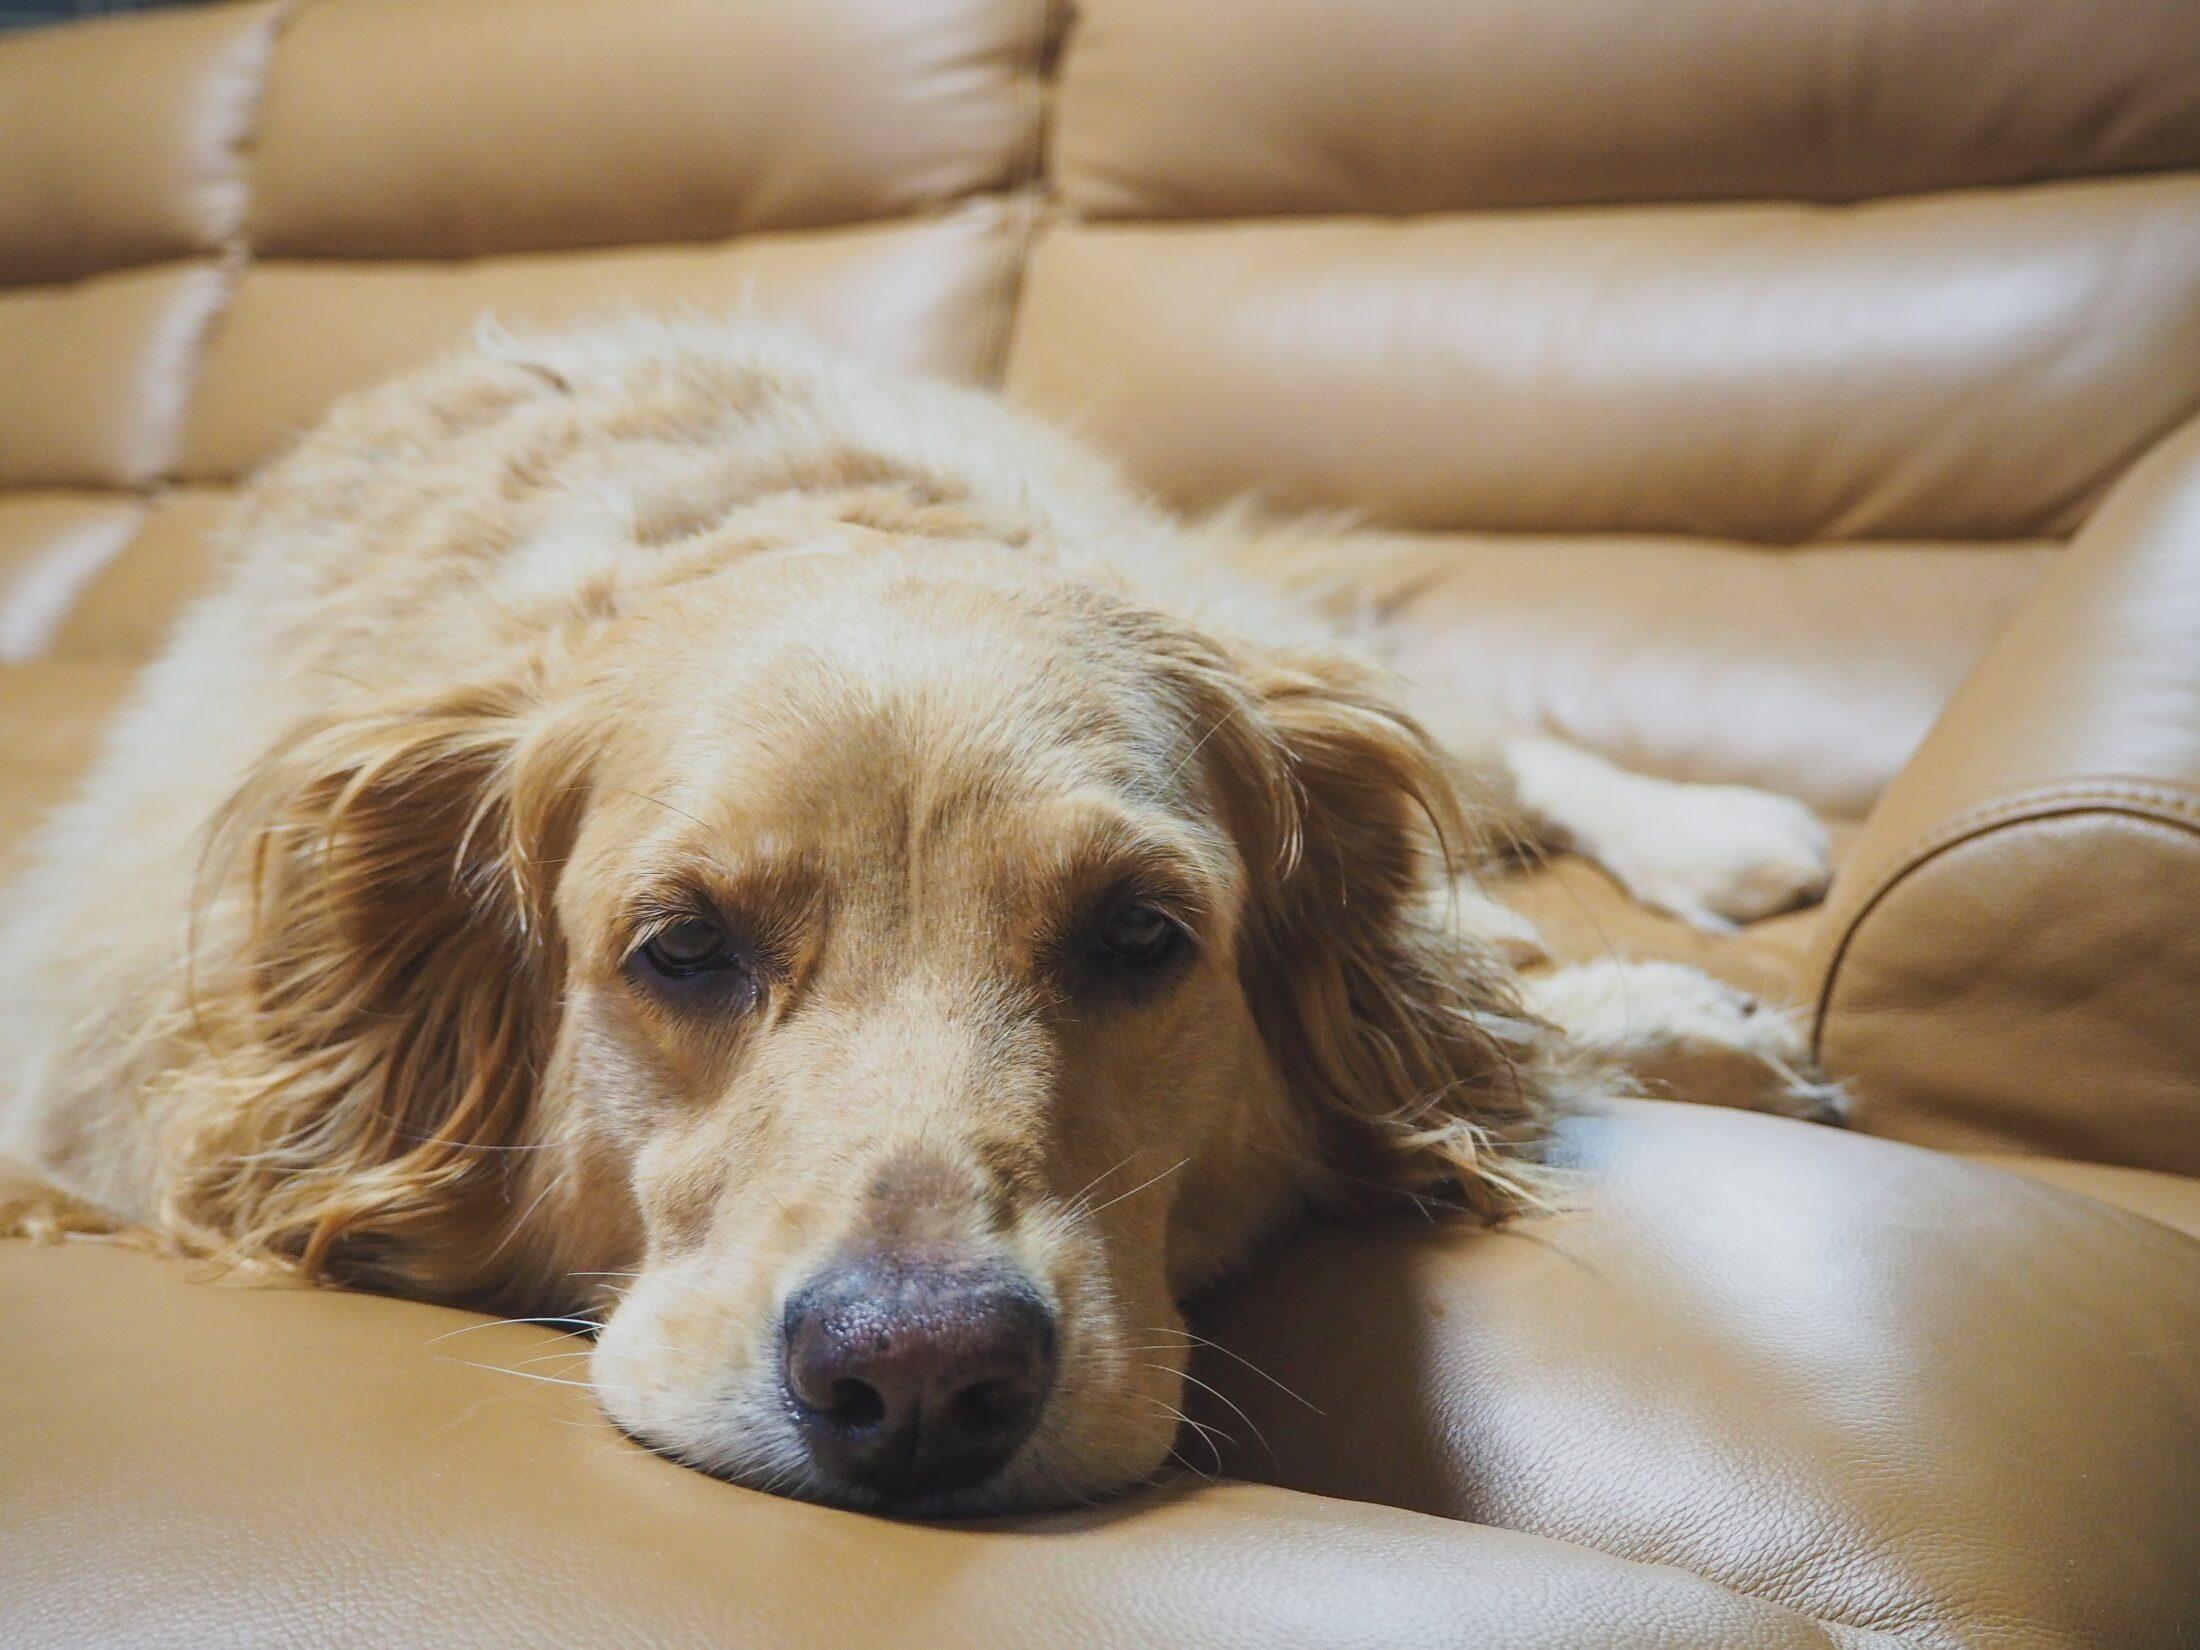 cachorro de mal humor deitado no sofá